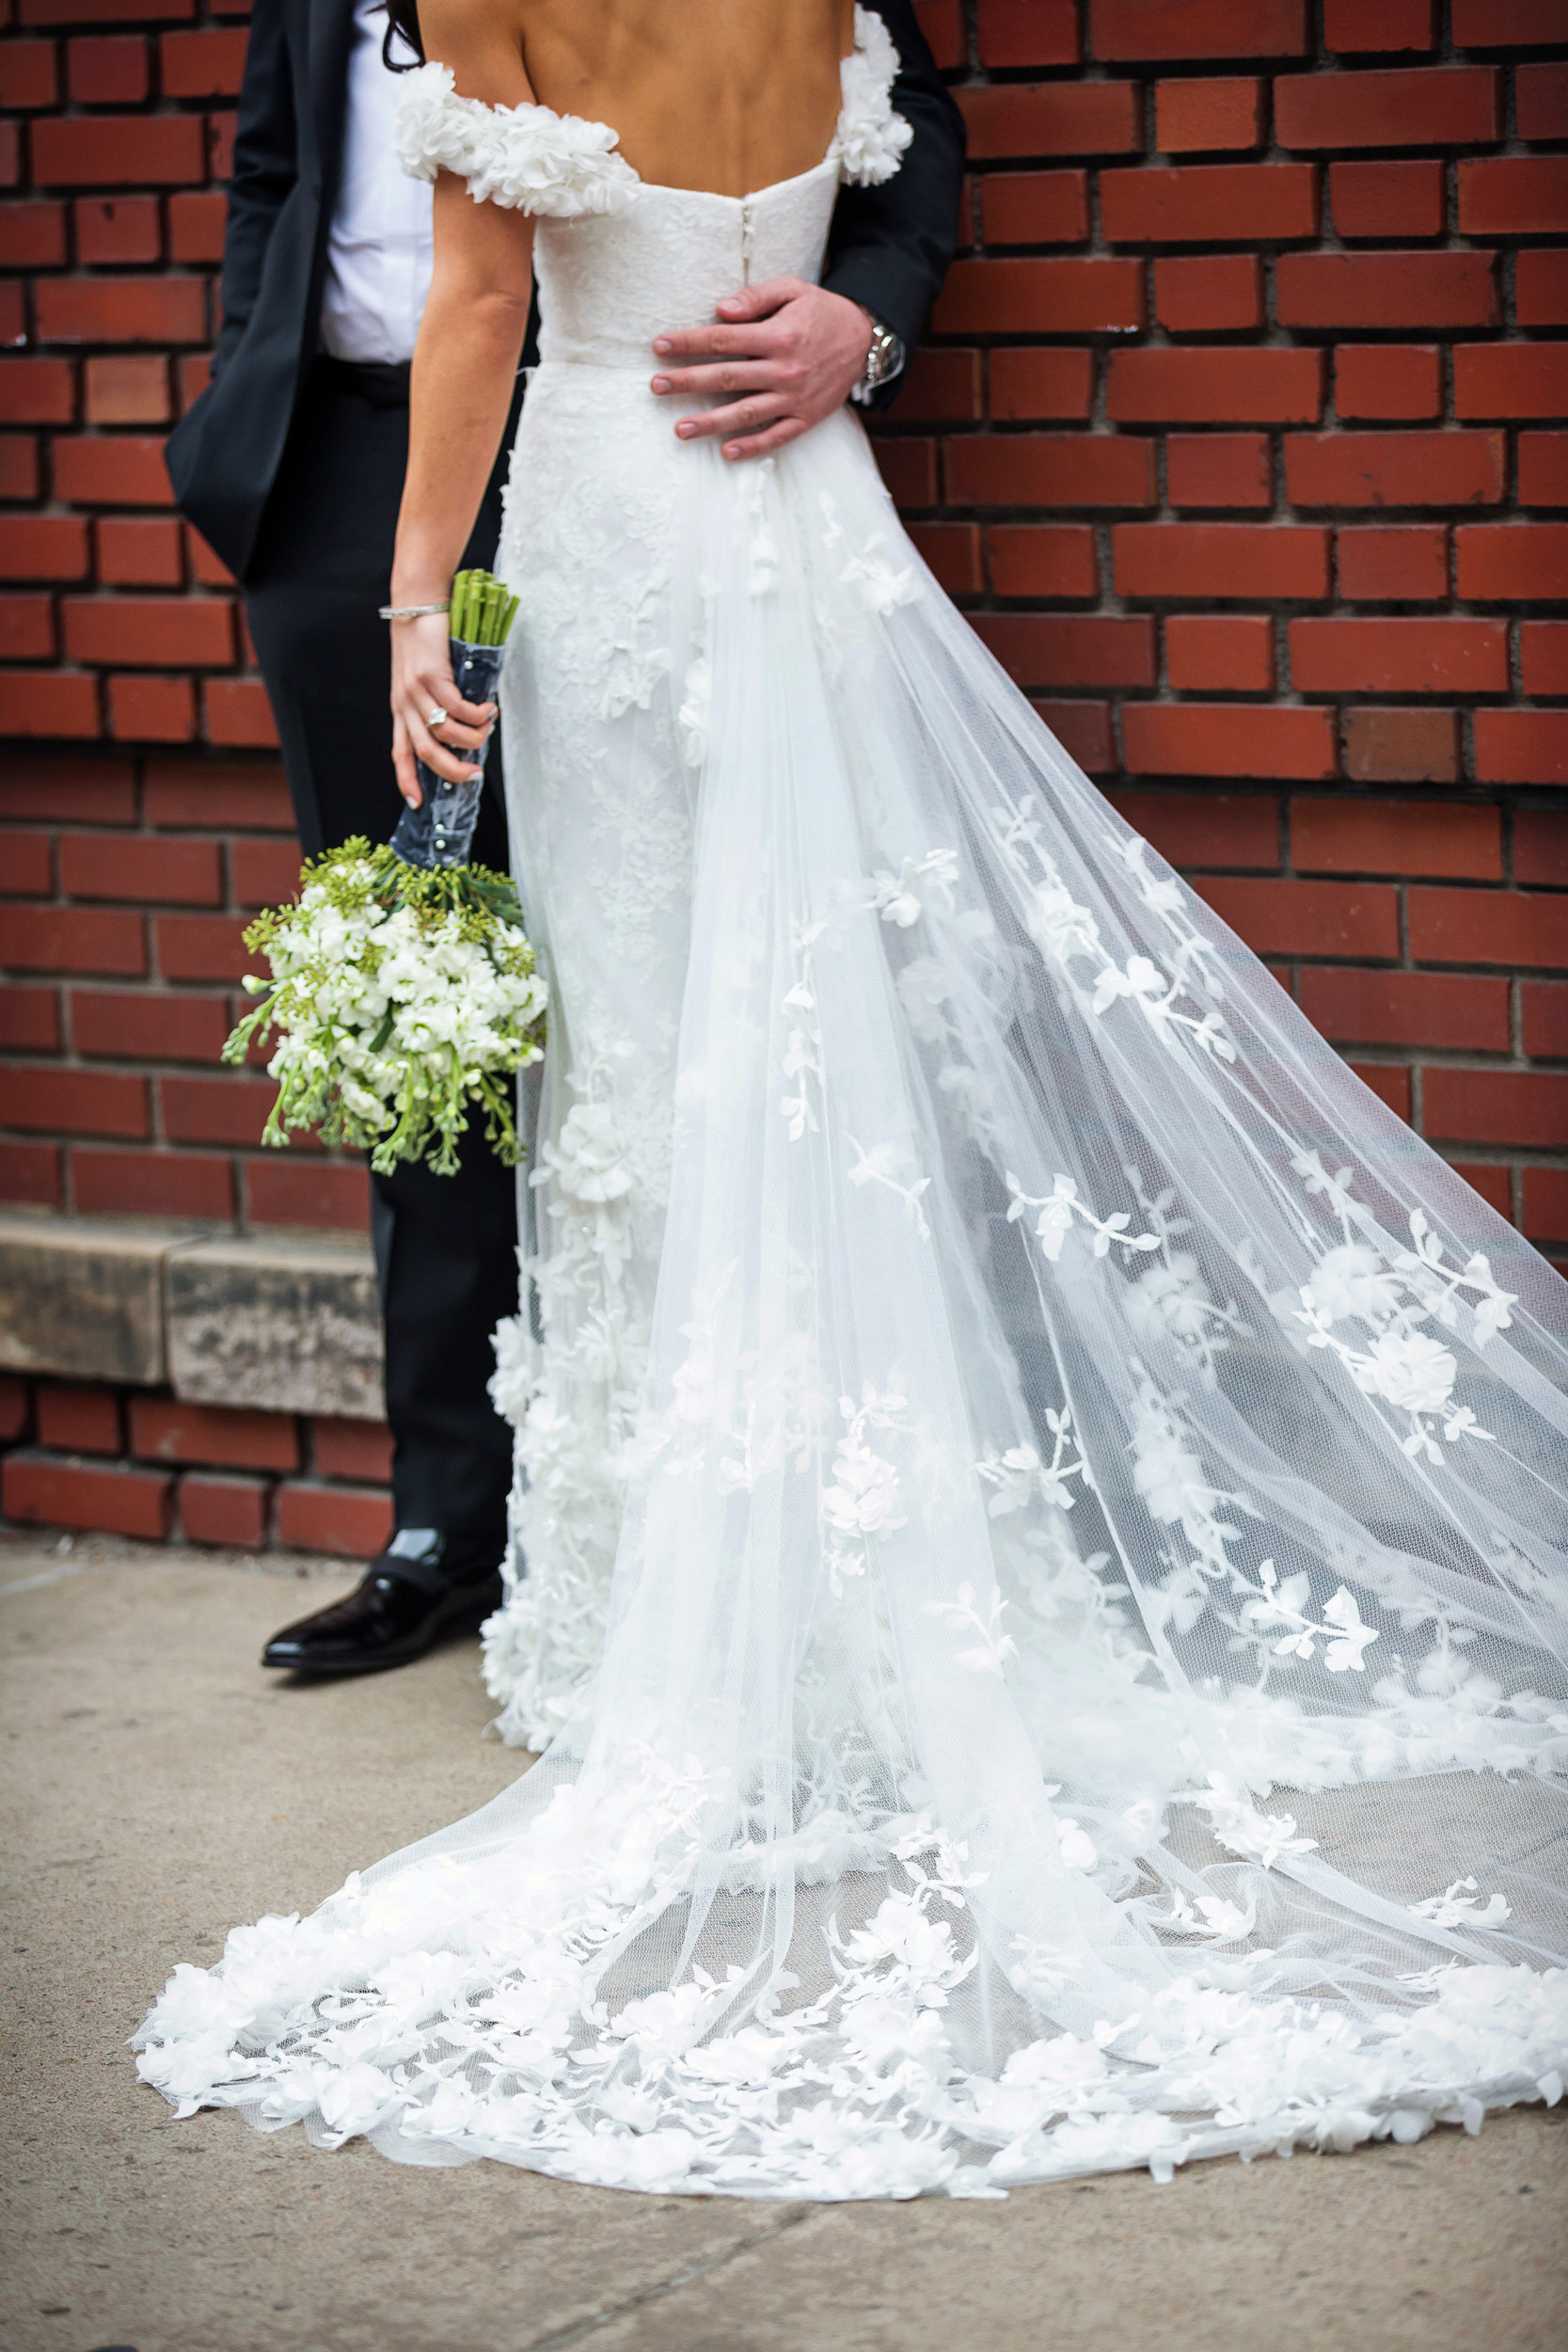 DCPA-Wedding-032.jpg